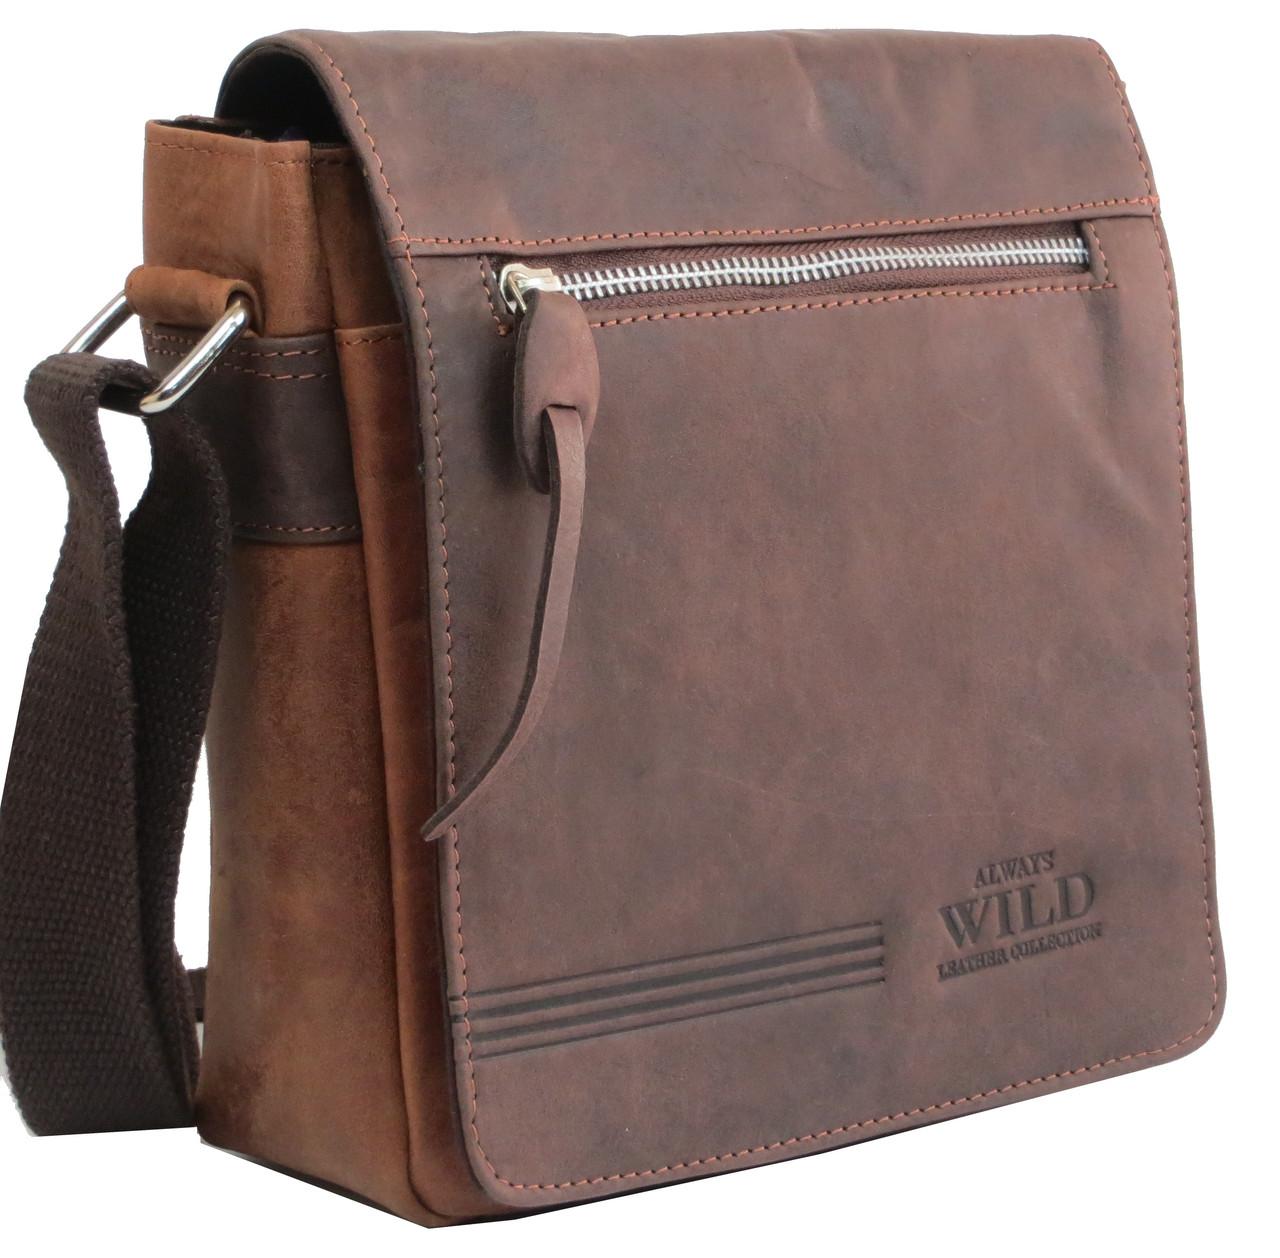 da066deedce1 Городская кожаная сумка на плечо Always Wild BAG2HB коричневая ...